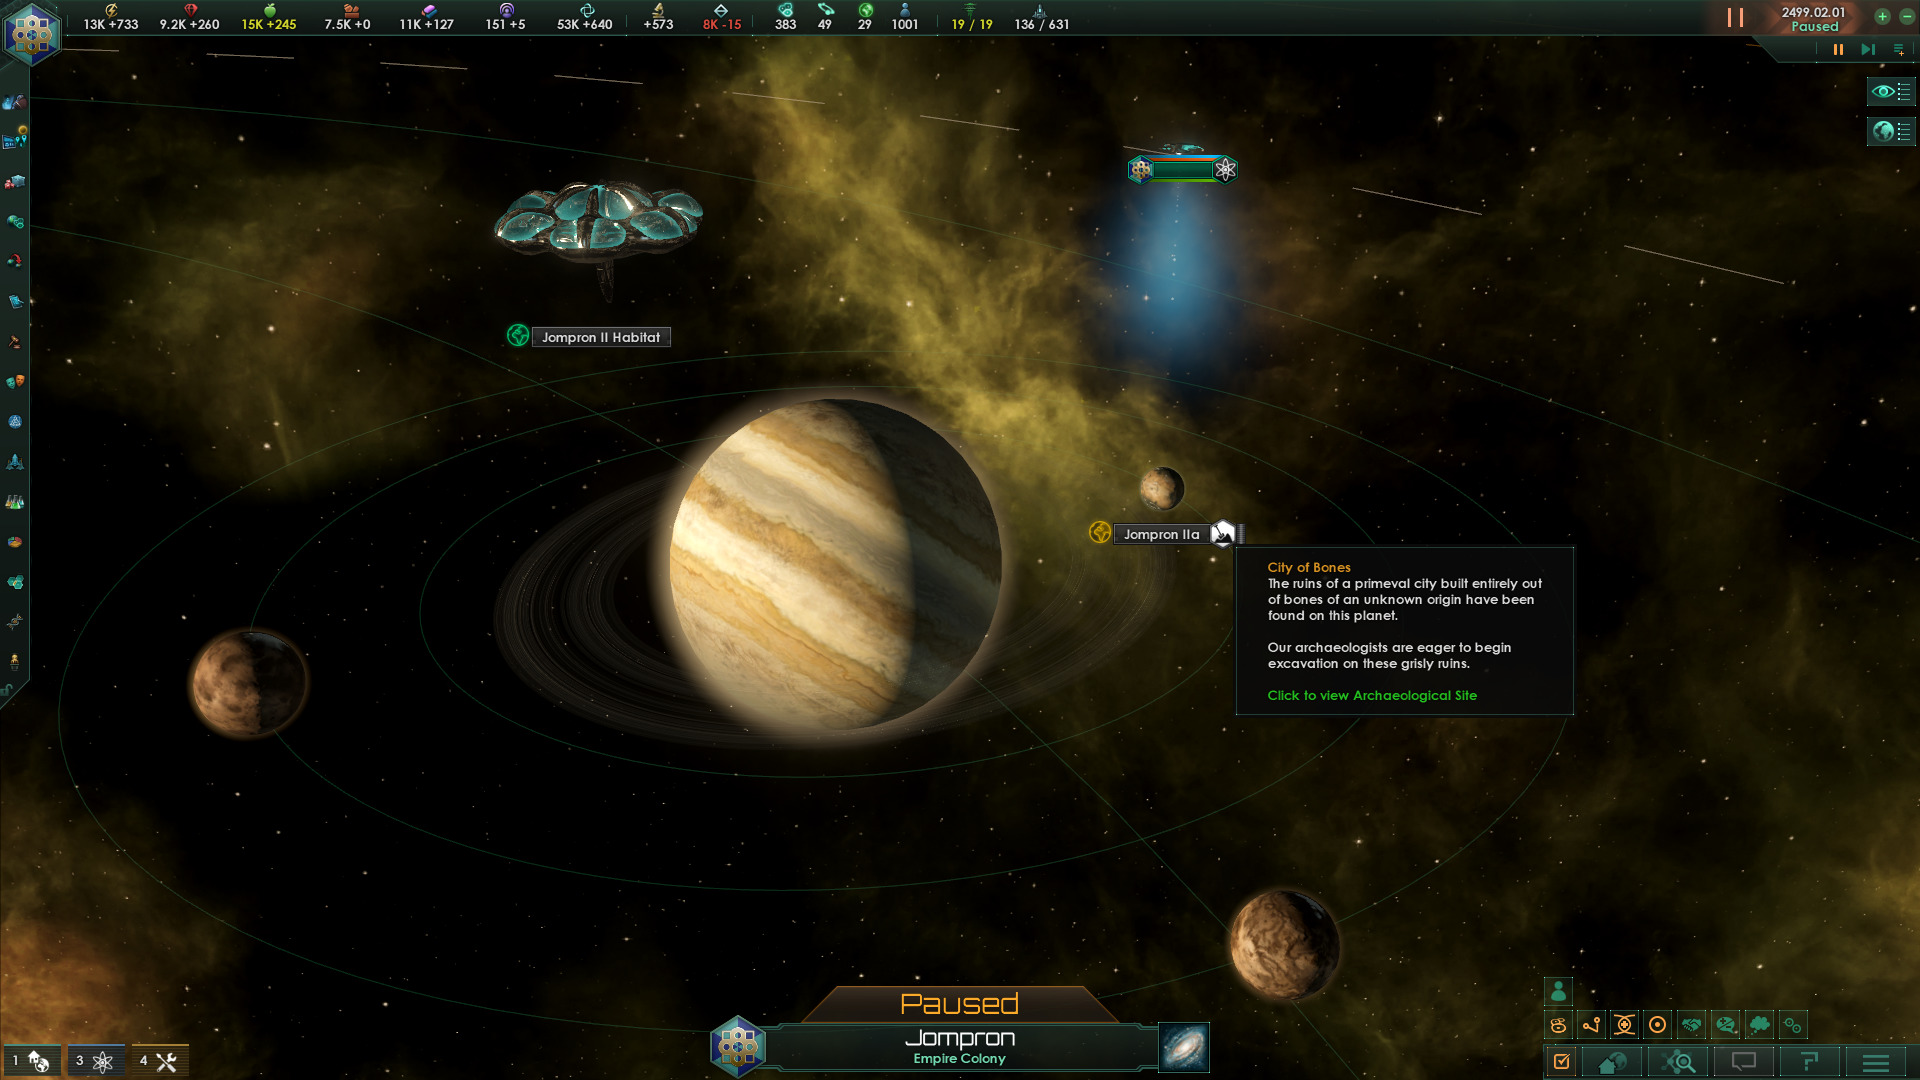 stellaris-galaxy-edition-pc-screenshot-01